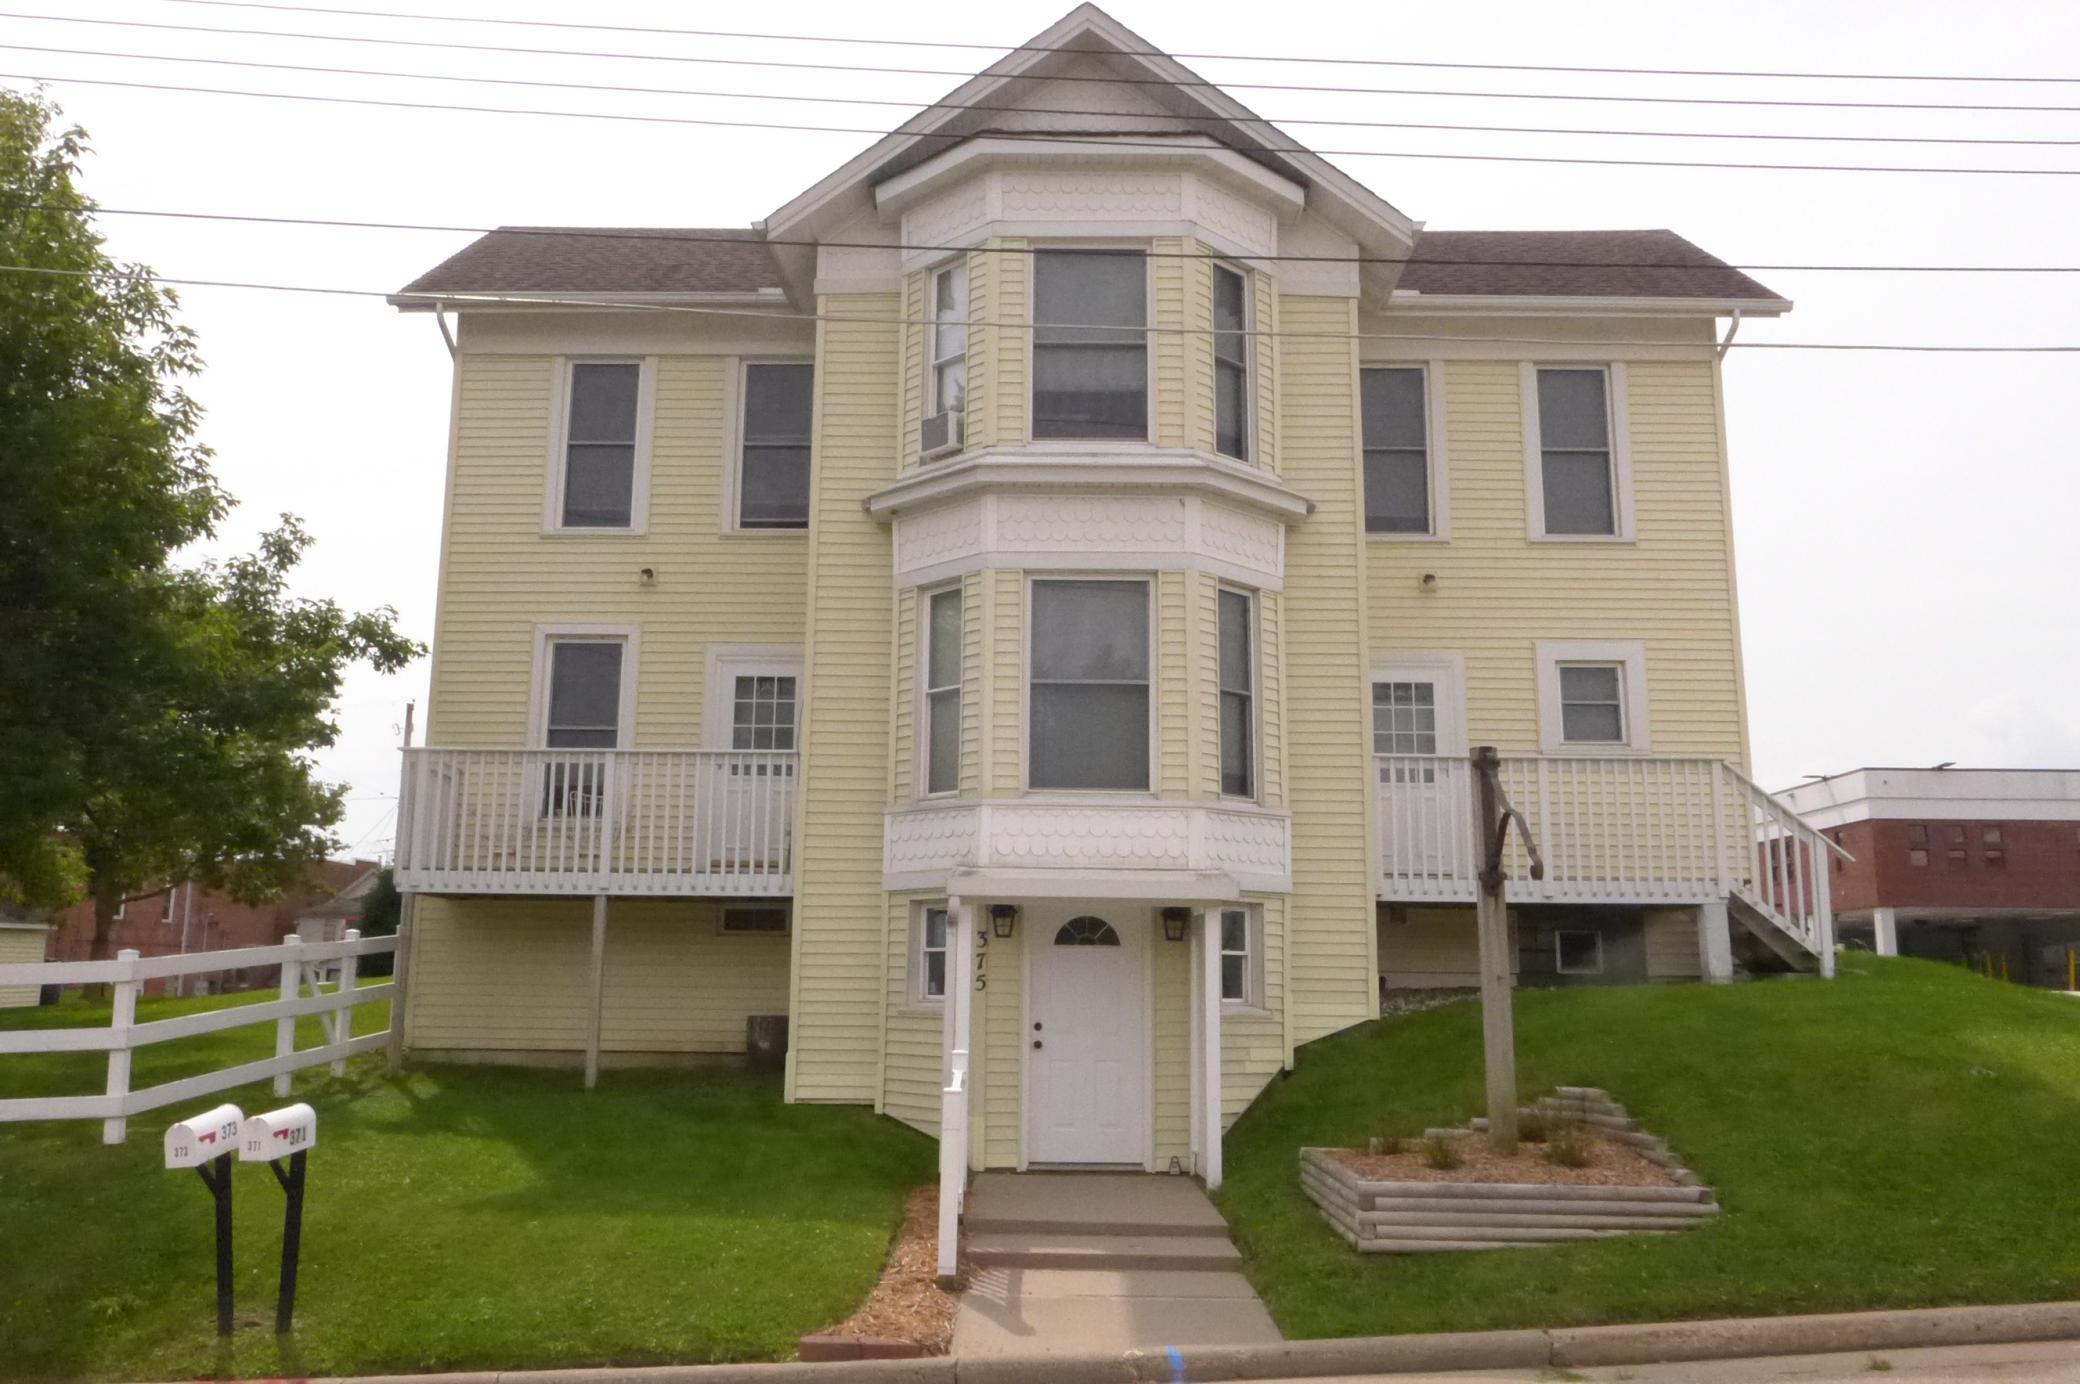 375 W Kinne Street #A Property Photo - Ellsworth, WI real estate listing